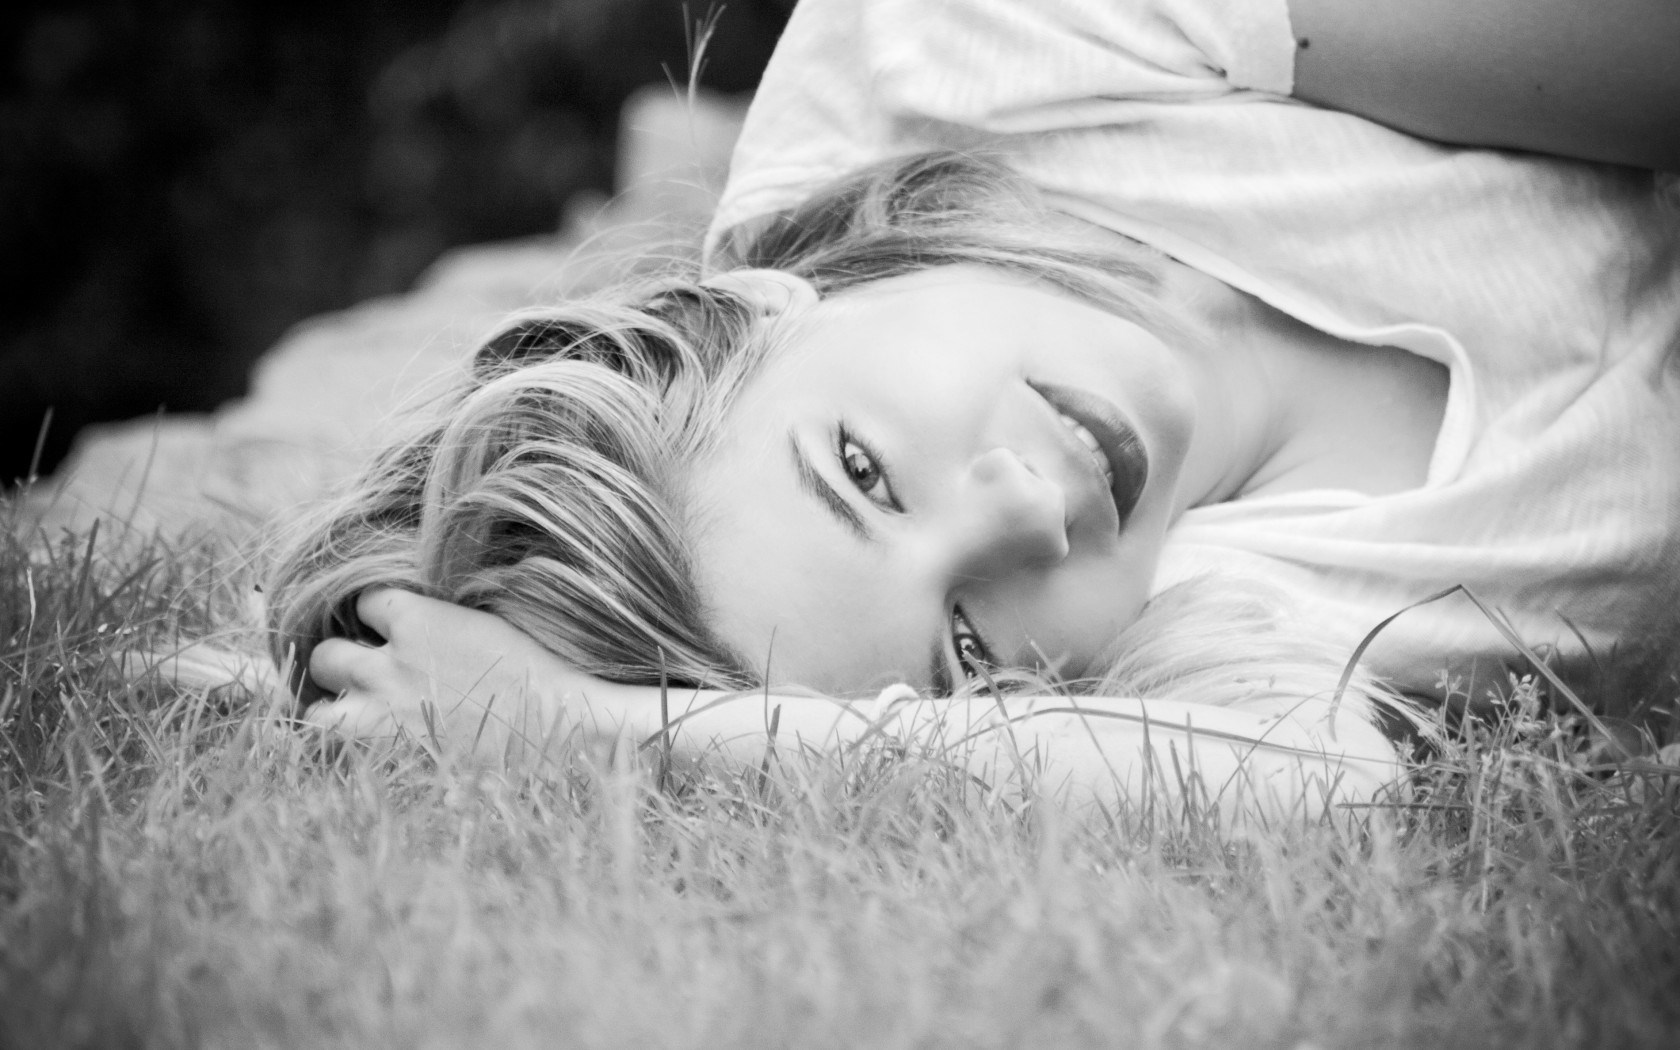 Mood Girl Black and White Photo